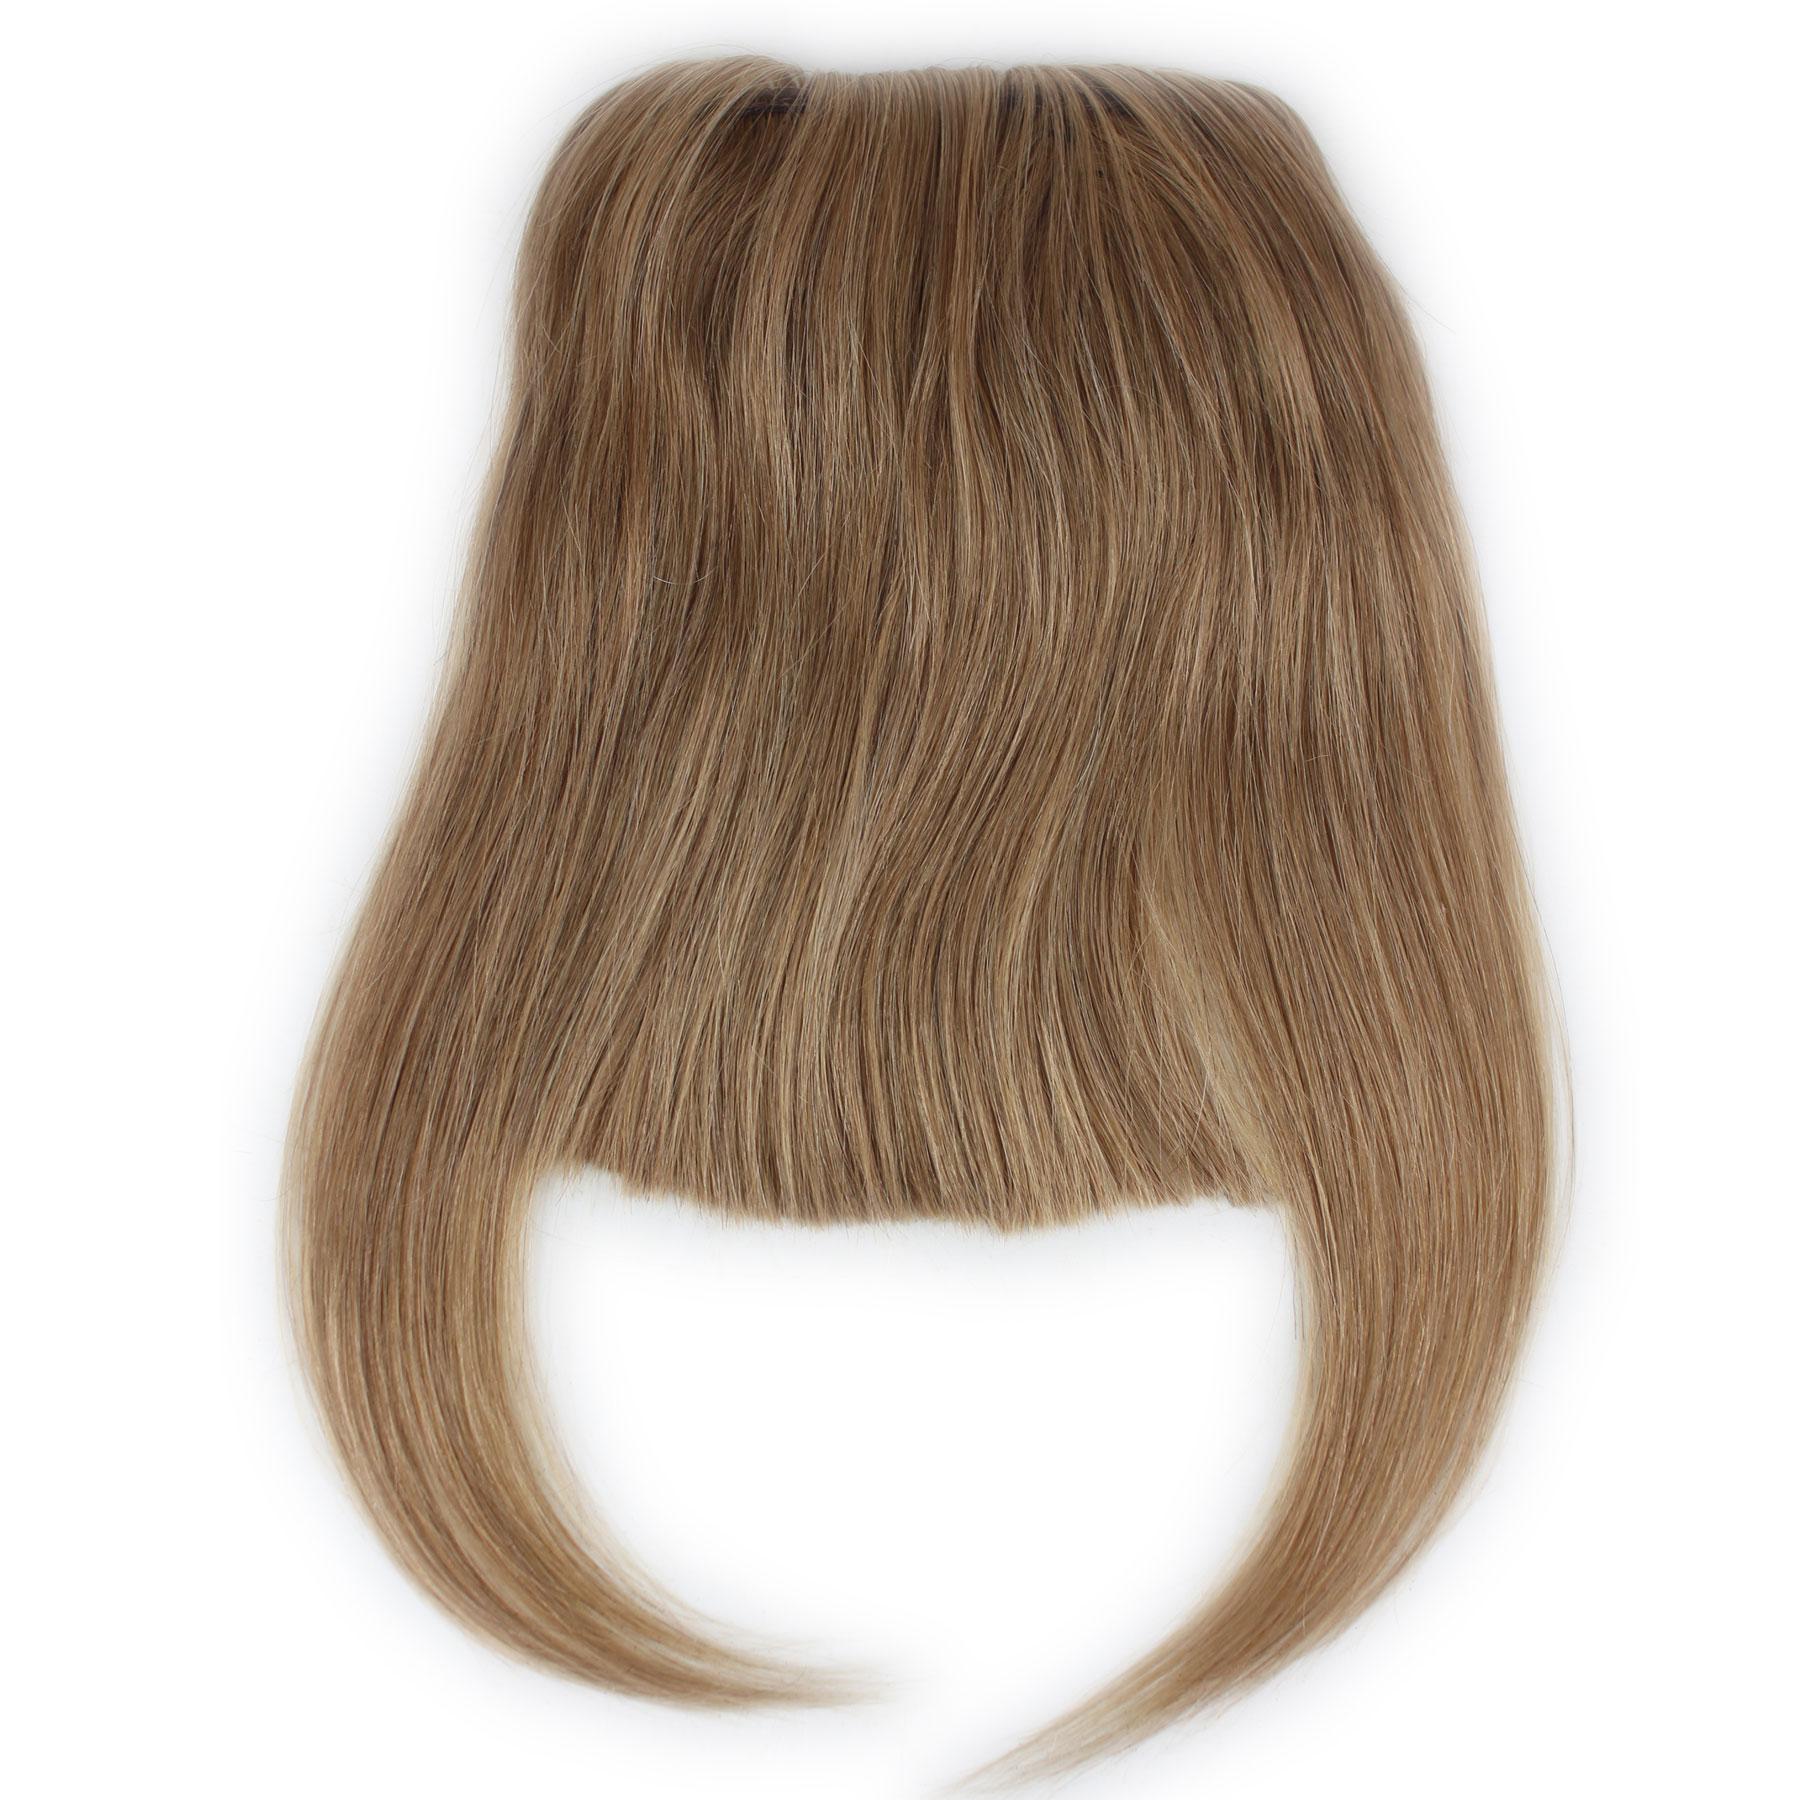 #27 Color Brazilian Human Hair Clip-in Hair Bang Full Fringe Short Straight Hair Extension For Women 6-8inch